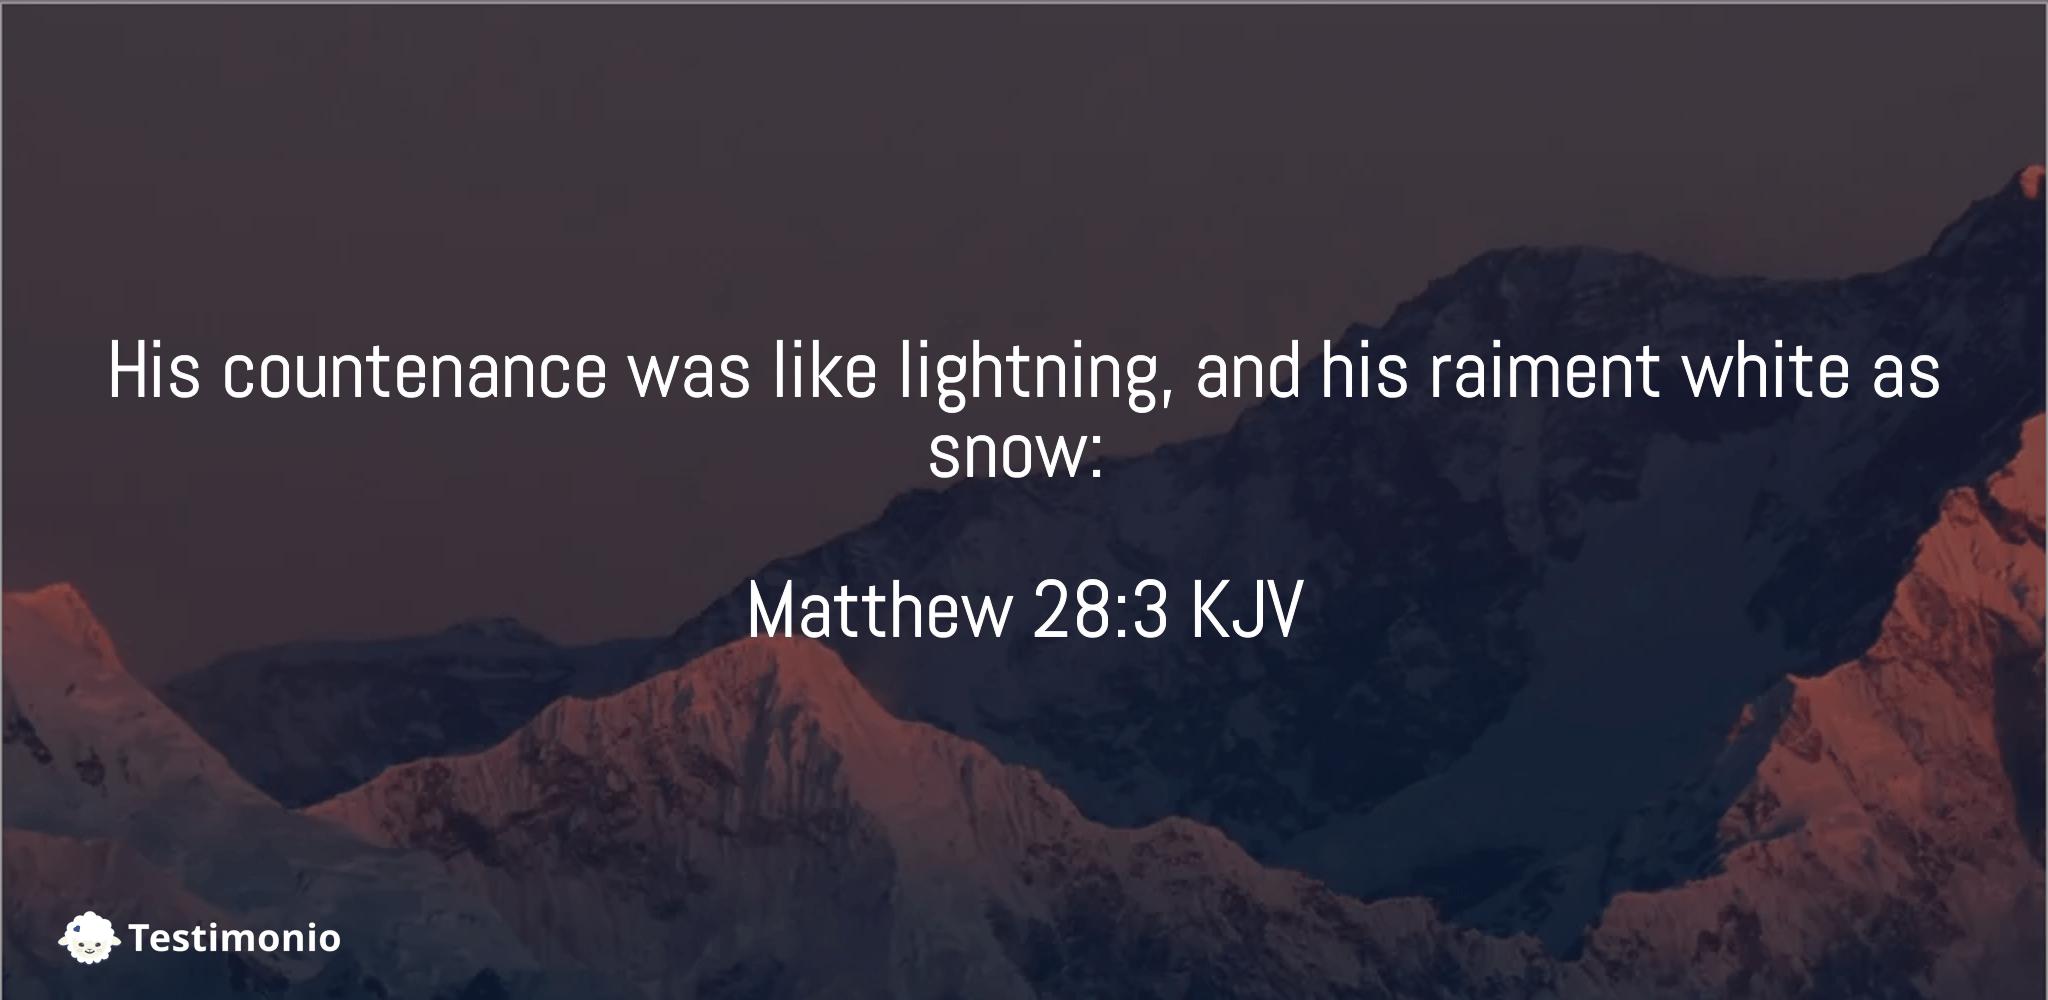 Matthew 28:3